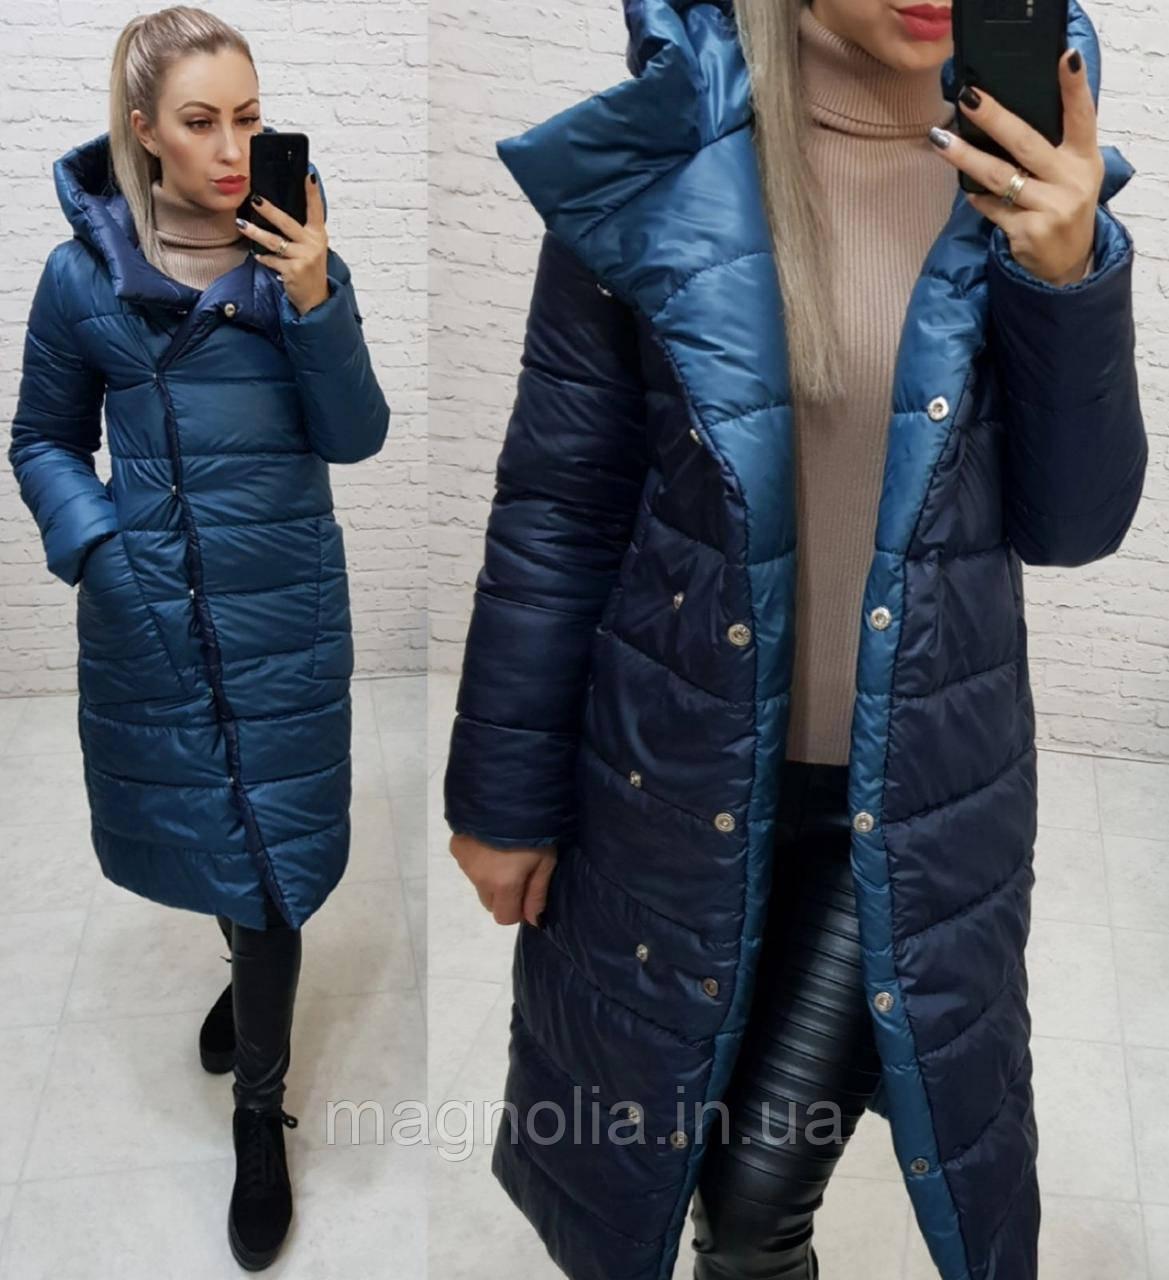 Куртка евро зима двусторонняя с капюшоном арт. 1007 темно синий + аквамарин